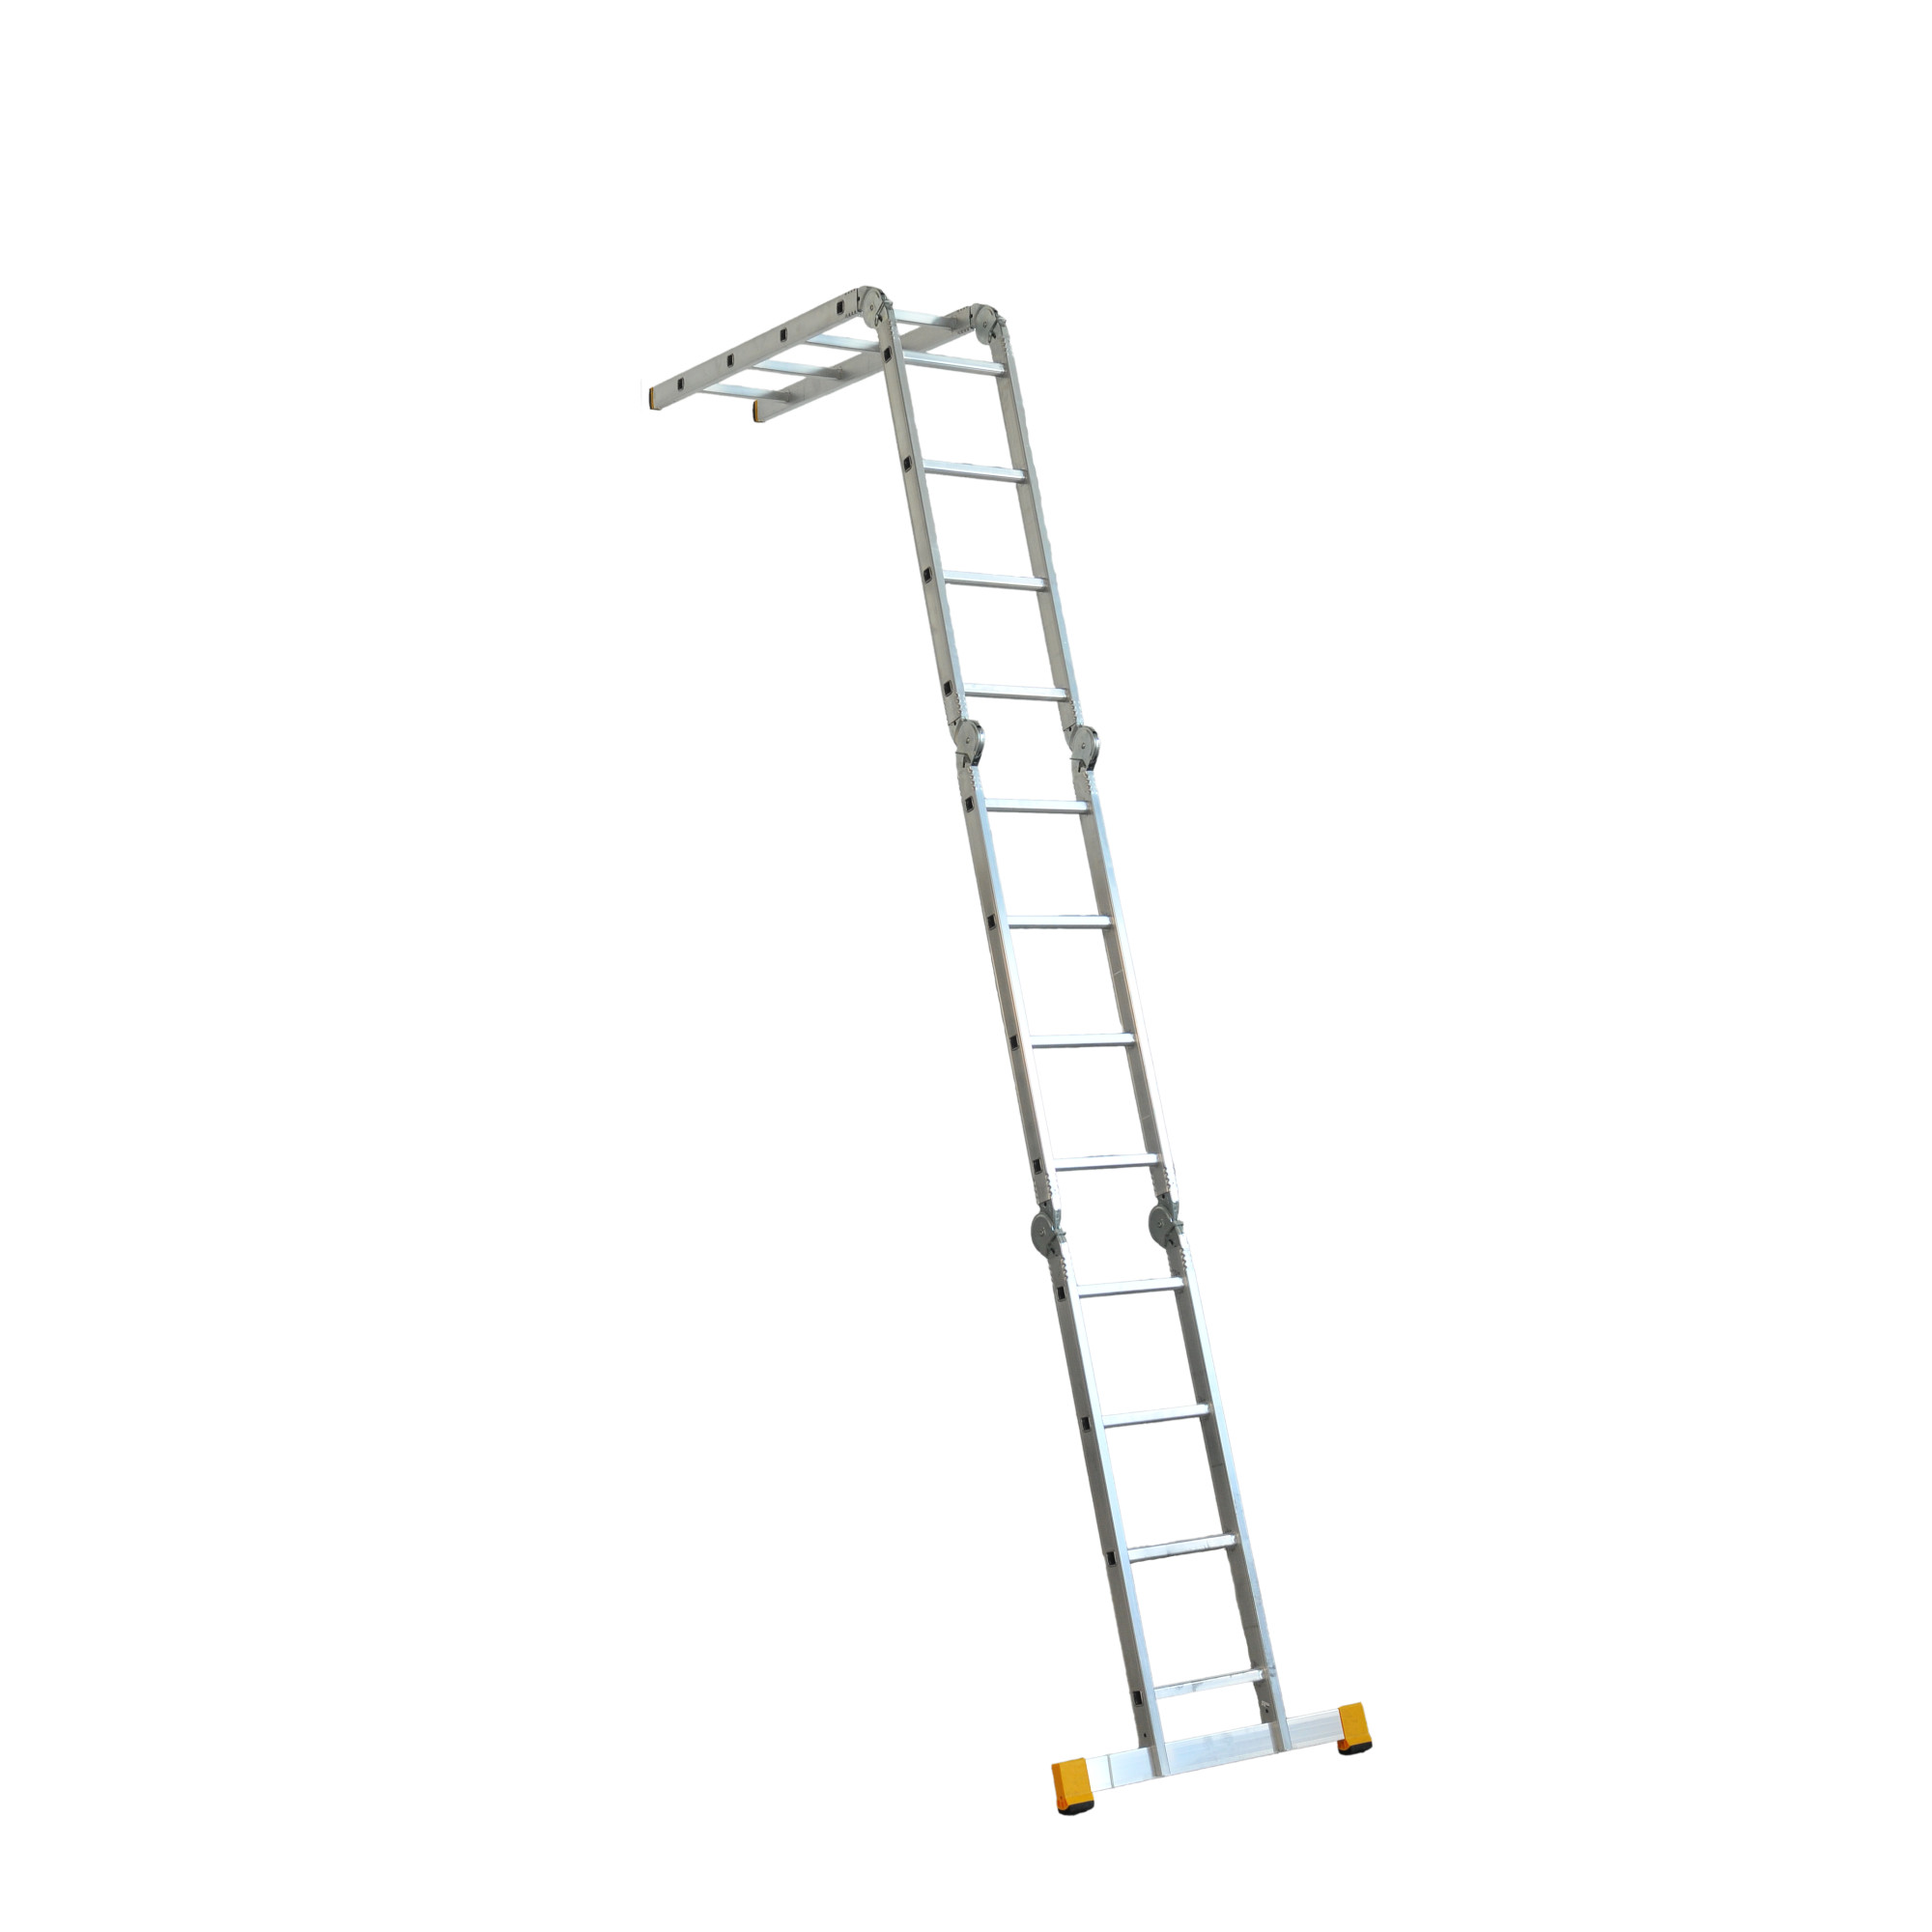 Scara aluminiu articulata Alverosal, 4 x 4 trepte, lungime 4.63 m, latime 350 mm imagine 2021 mathaus